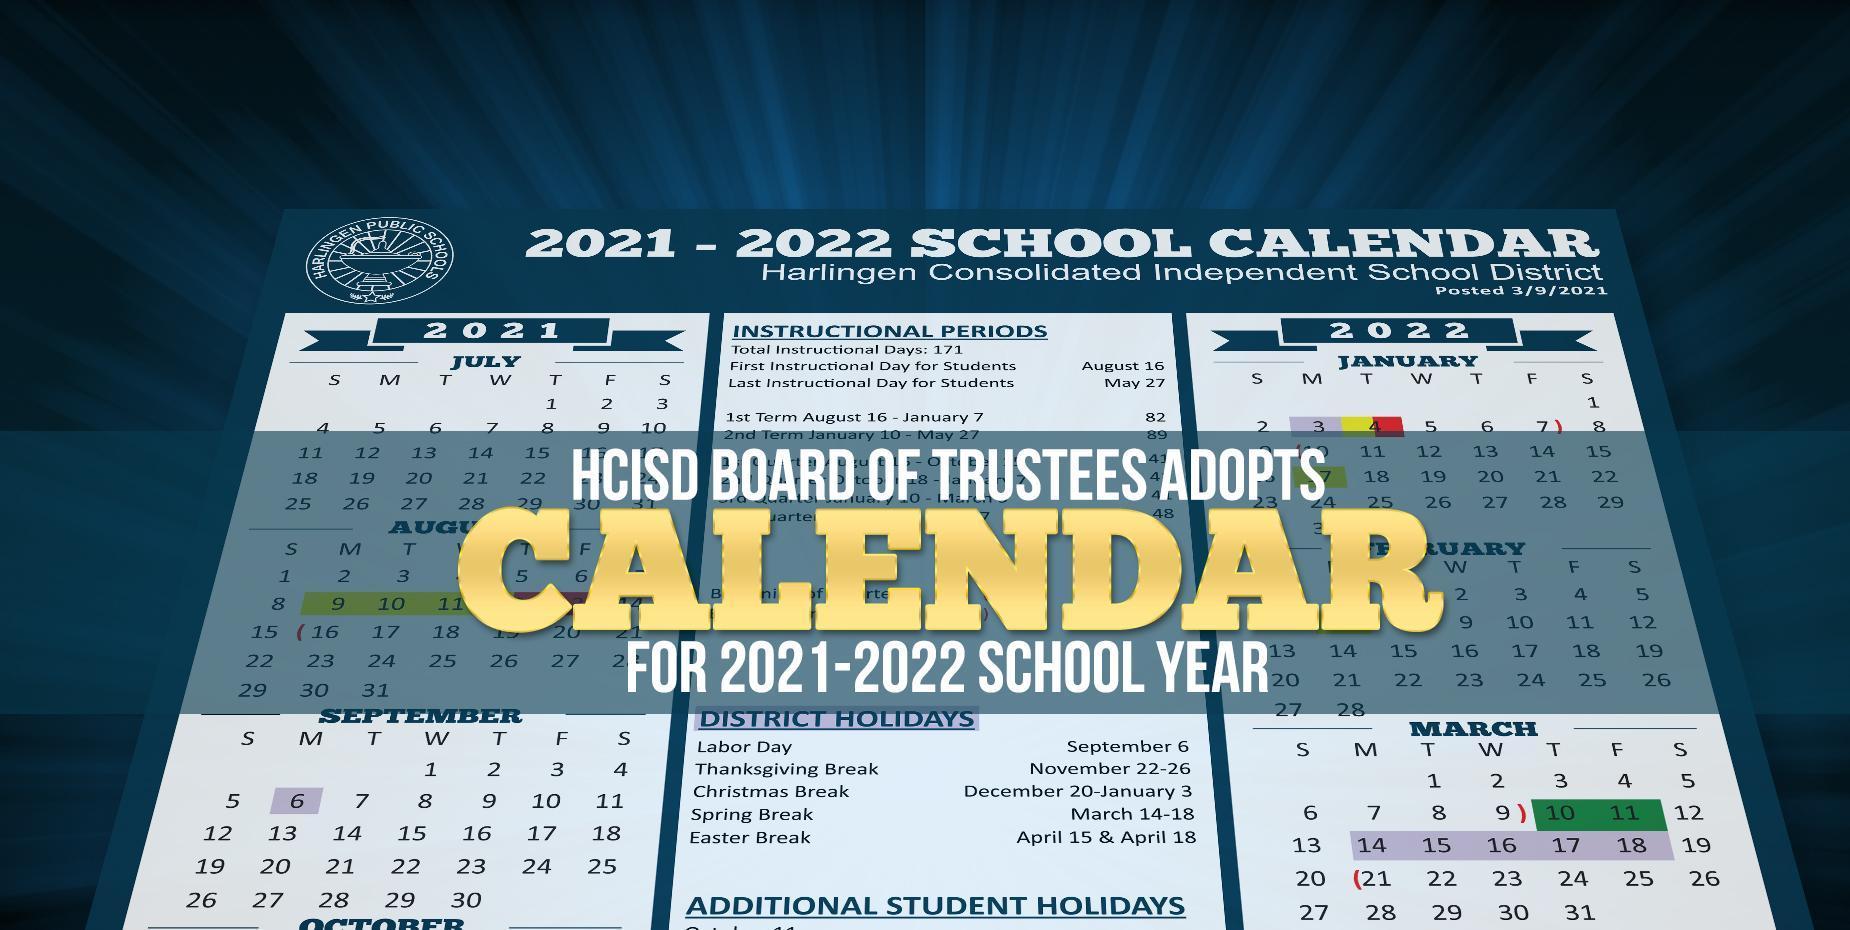 HCISD Board adopts calendar for 2021-2022 year